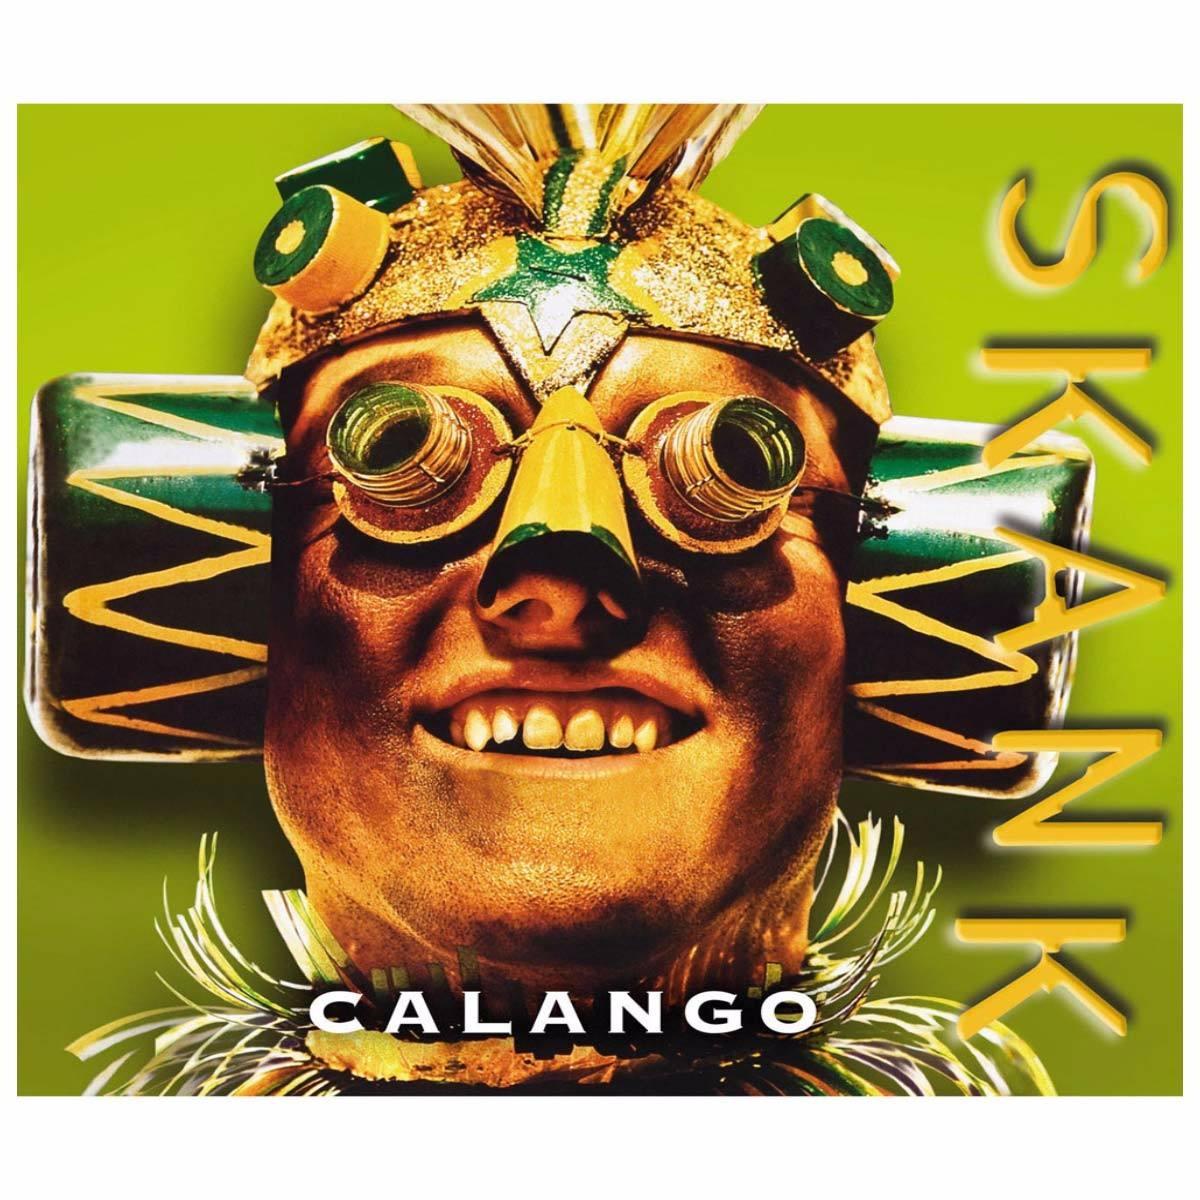 cd skank calango gratis